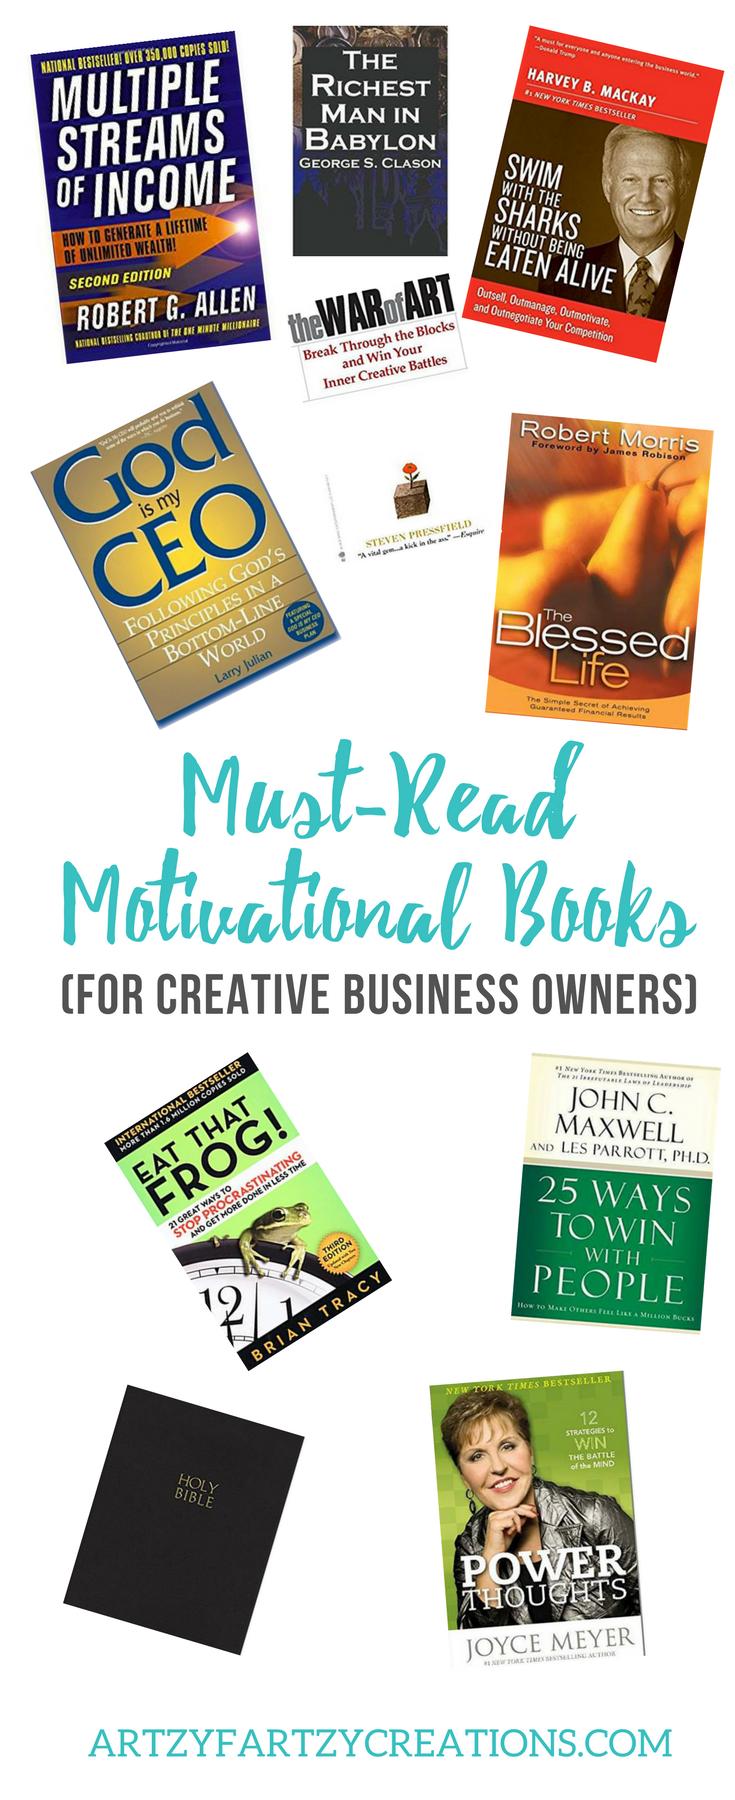 My Top Ten Motivational Books For